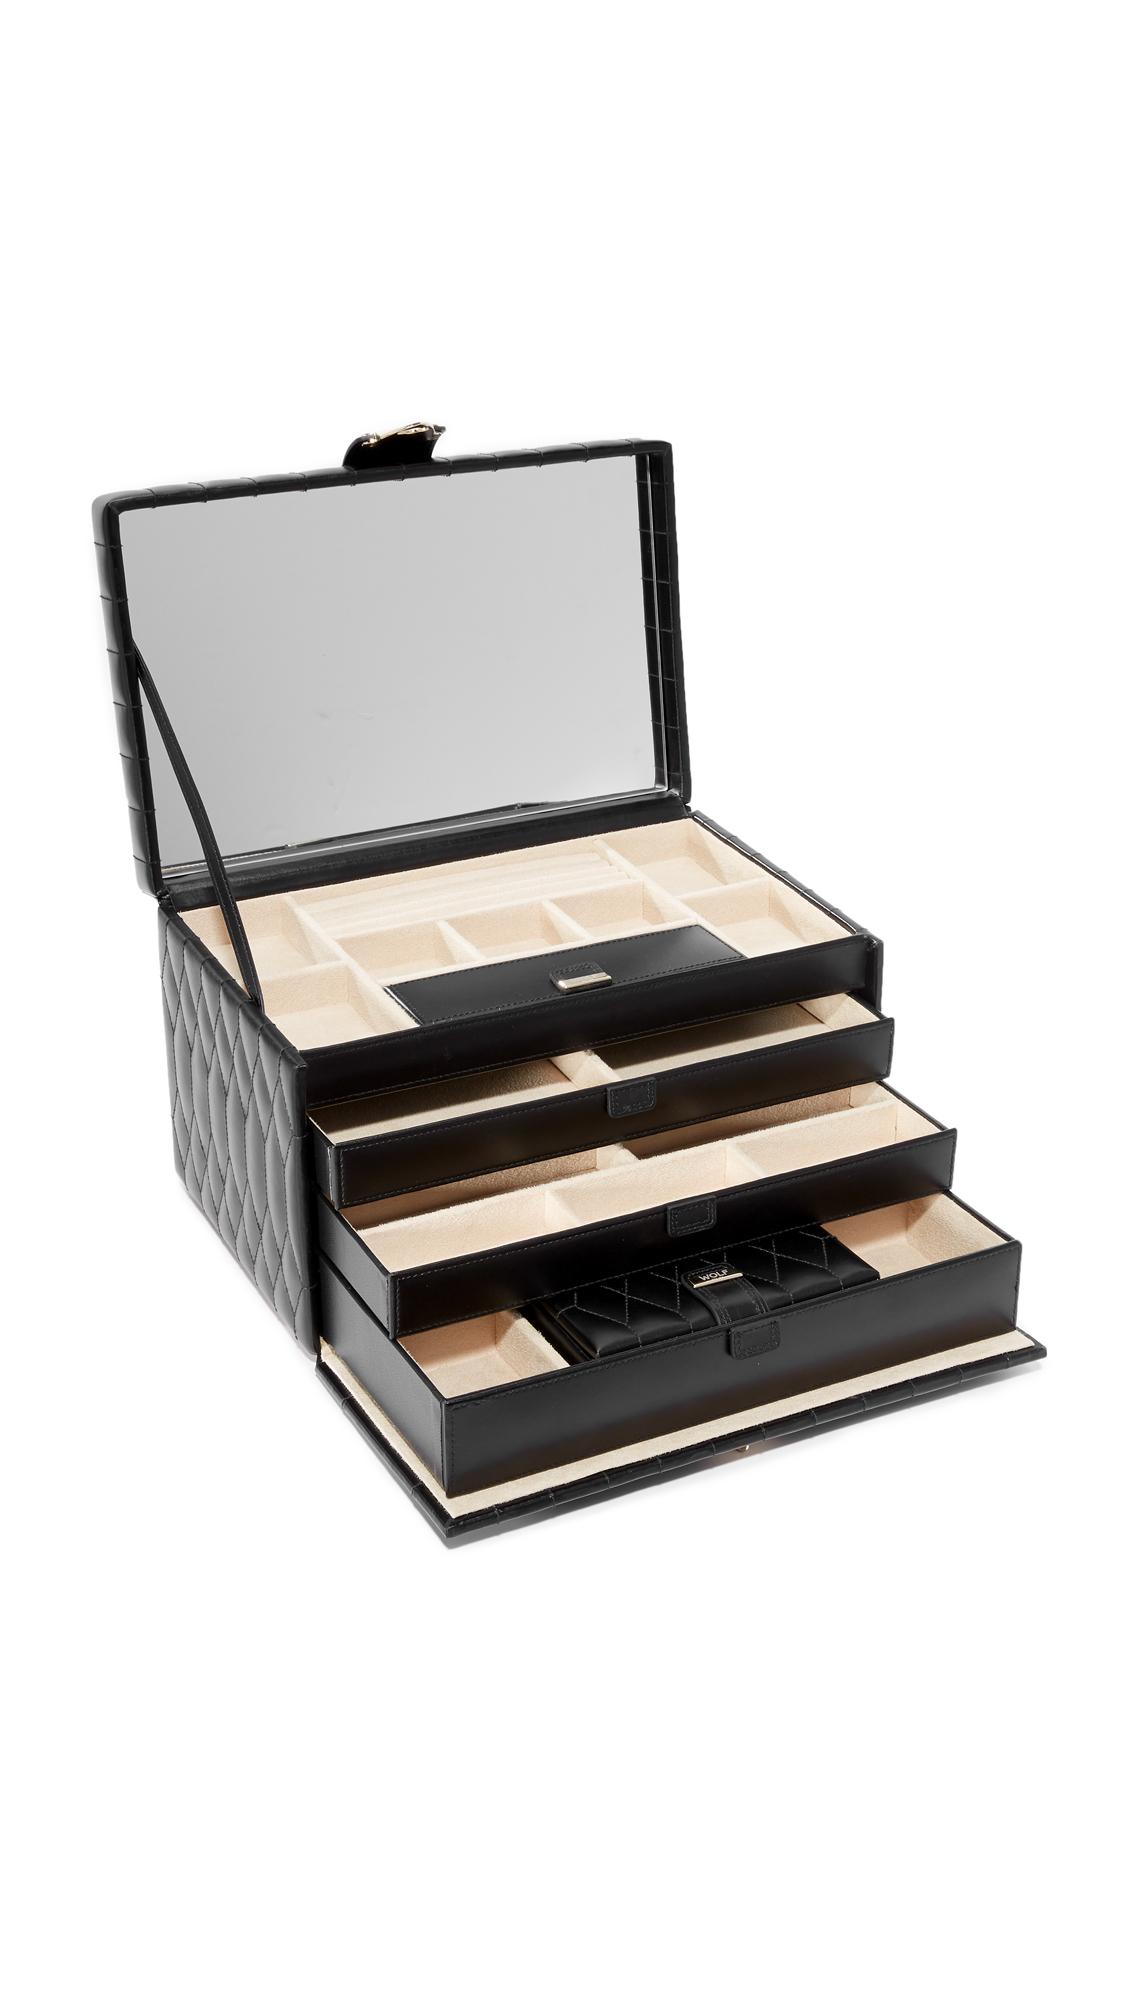 Gift Boutique WOLF Caroline Large Jewelry Case - Black